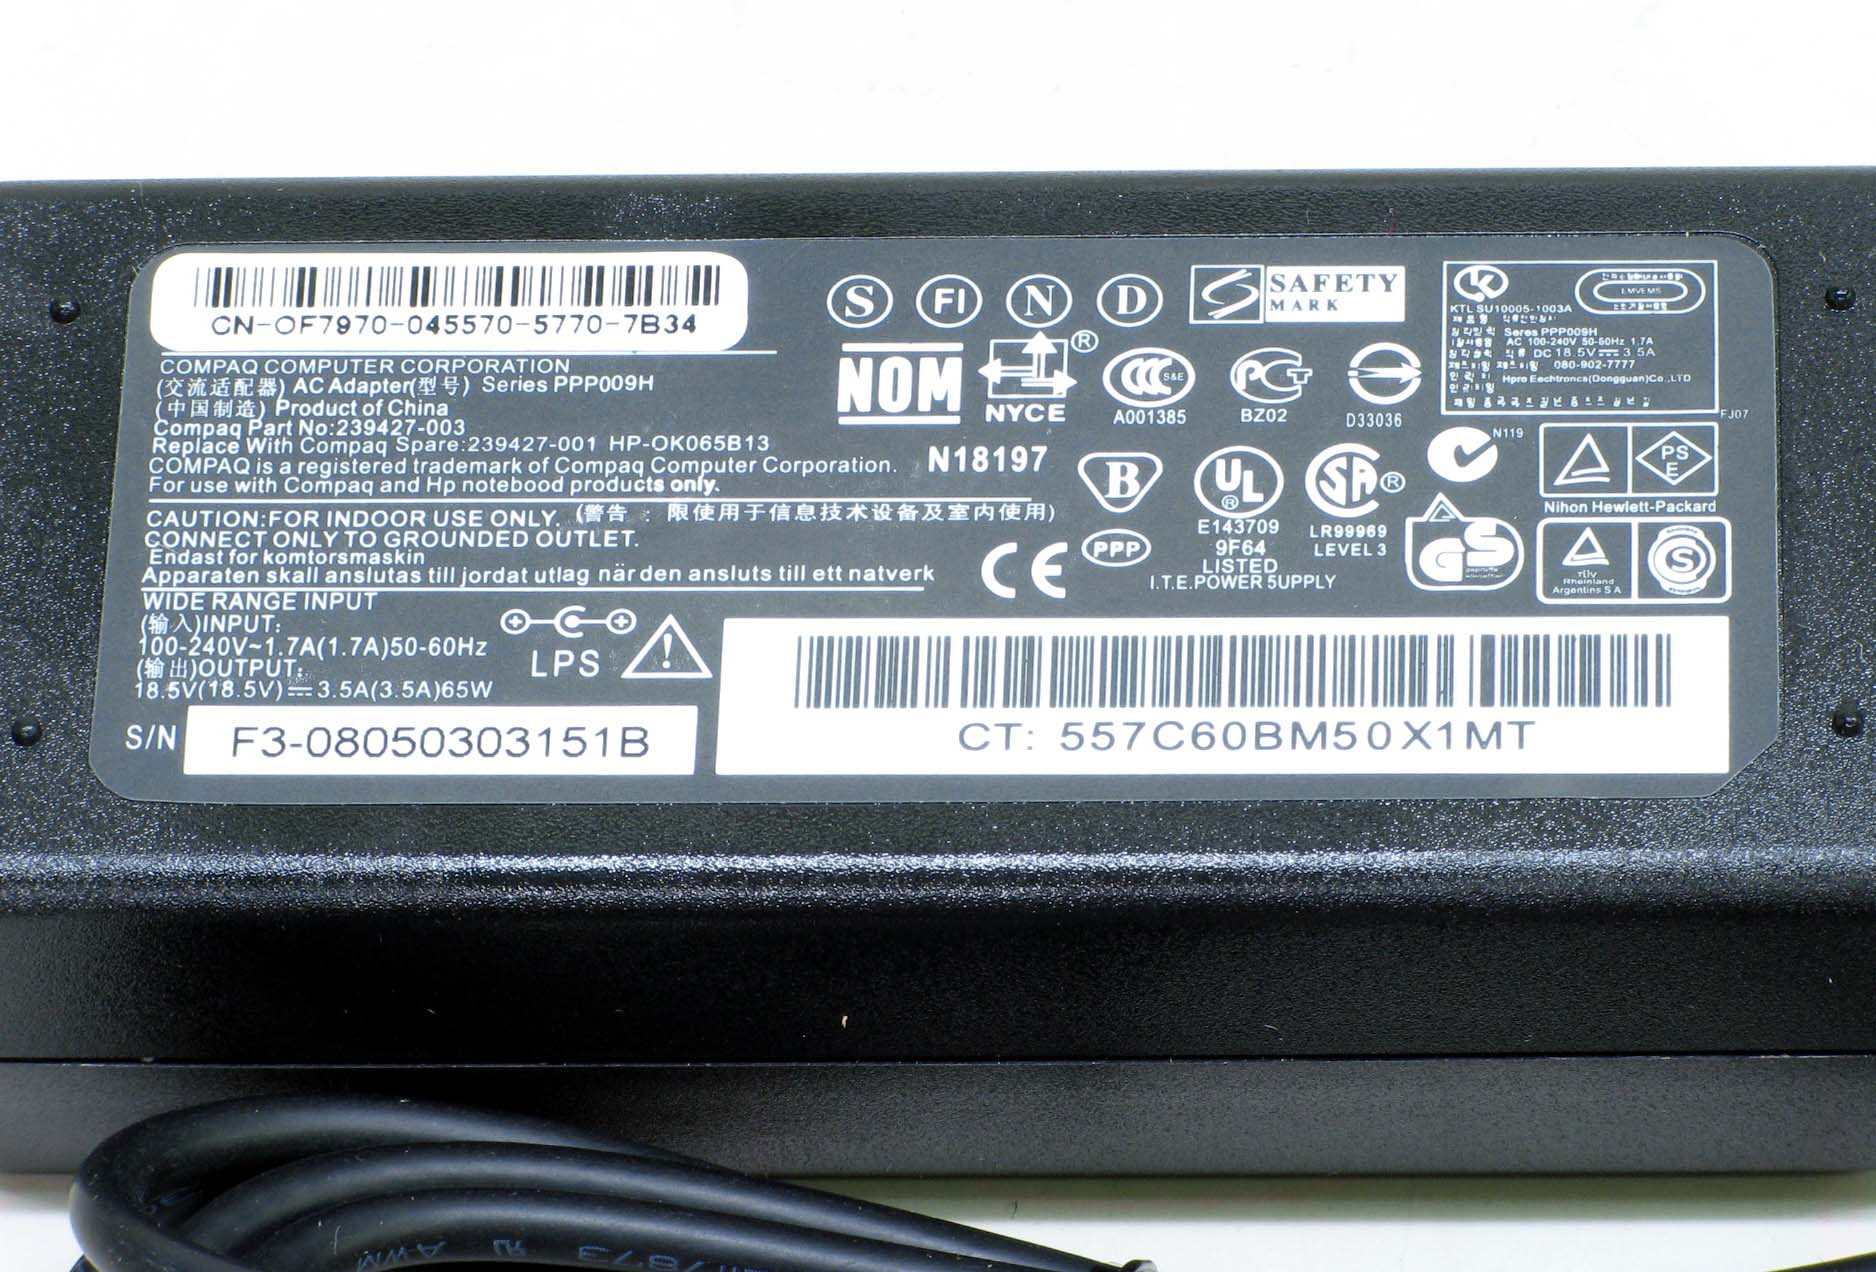 N-5/hp純正 ノート用ACアダプタ 18.5V 3.5A(PPP009H)